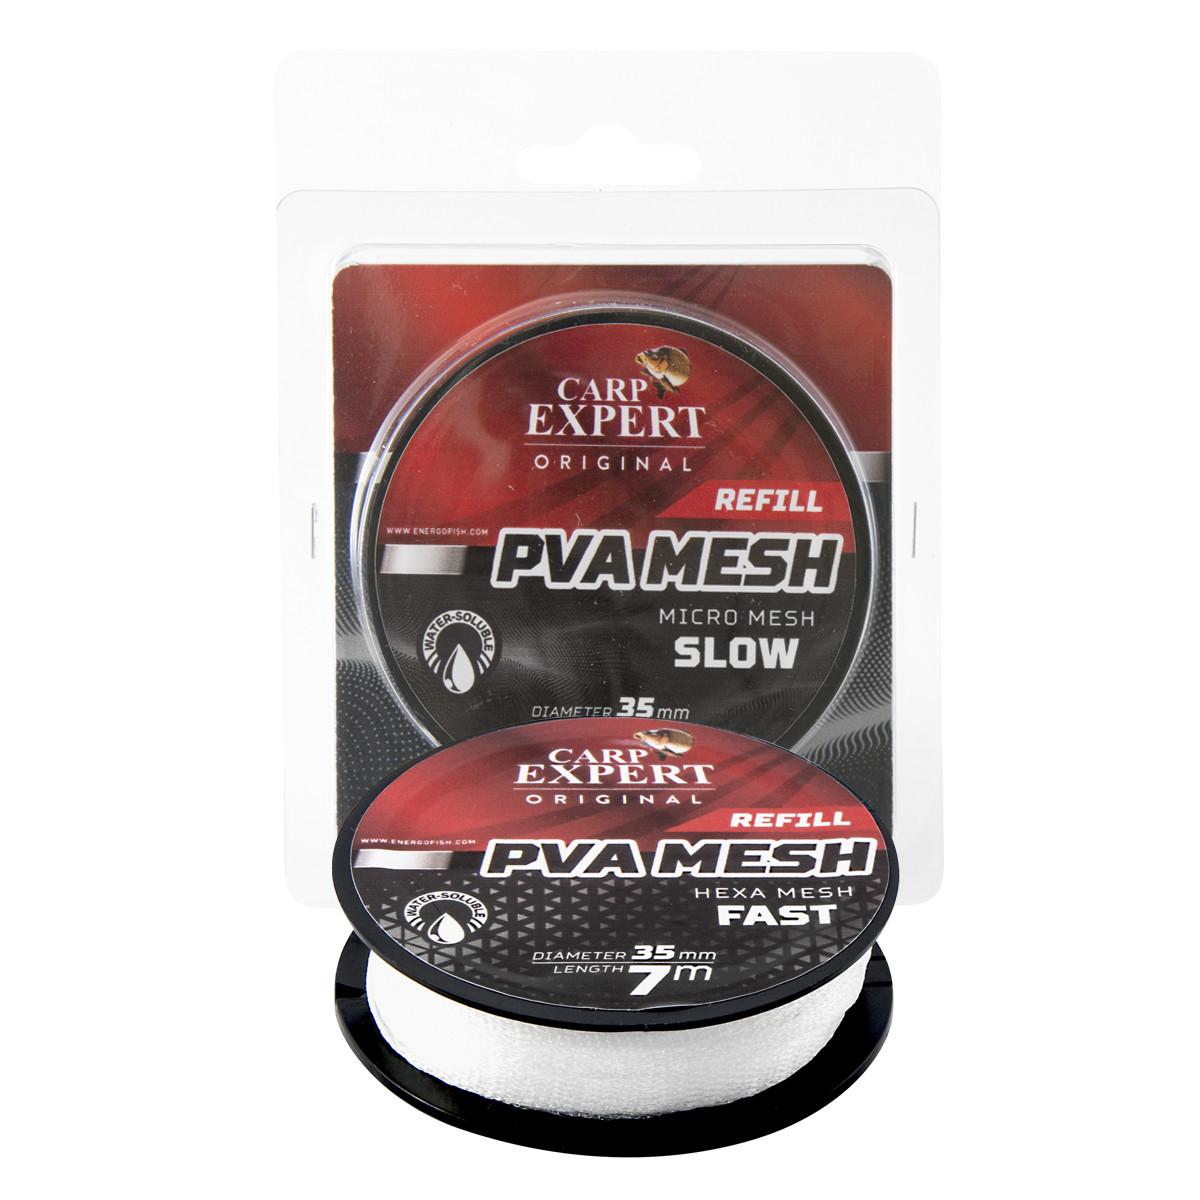 ПВА-сетка для рыбалки 7м 35мм на шпуле Energofish Carp Expert PVA Refill Micro Mesh Slow Melt (30141225)